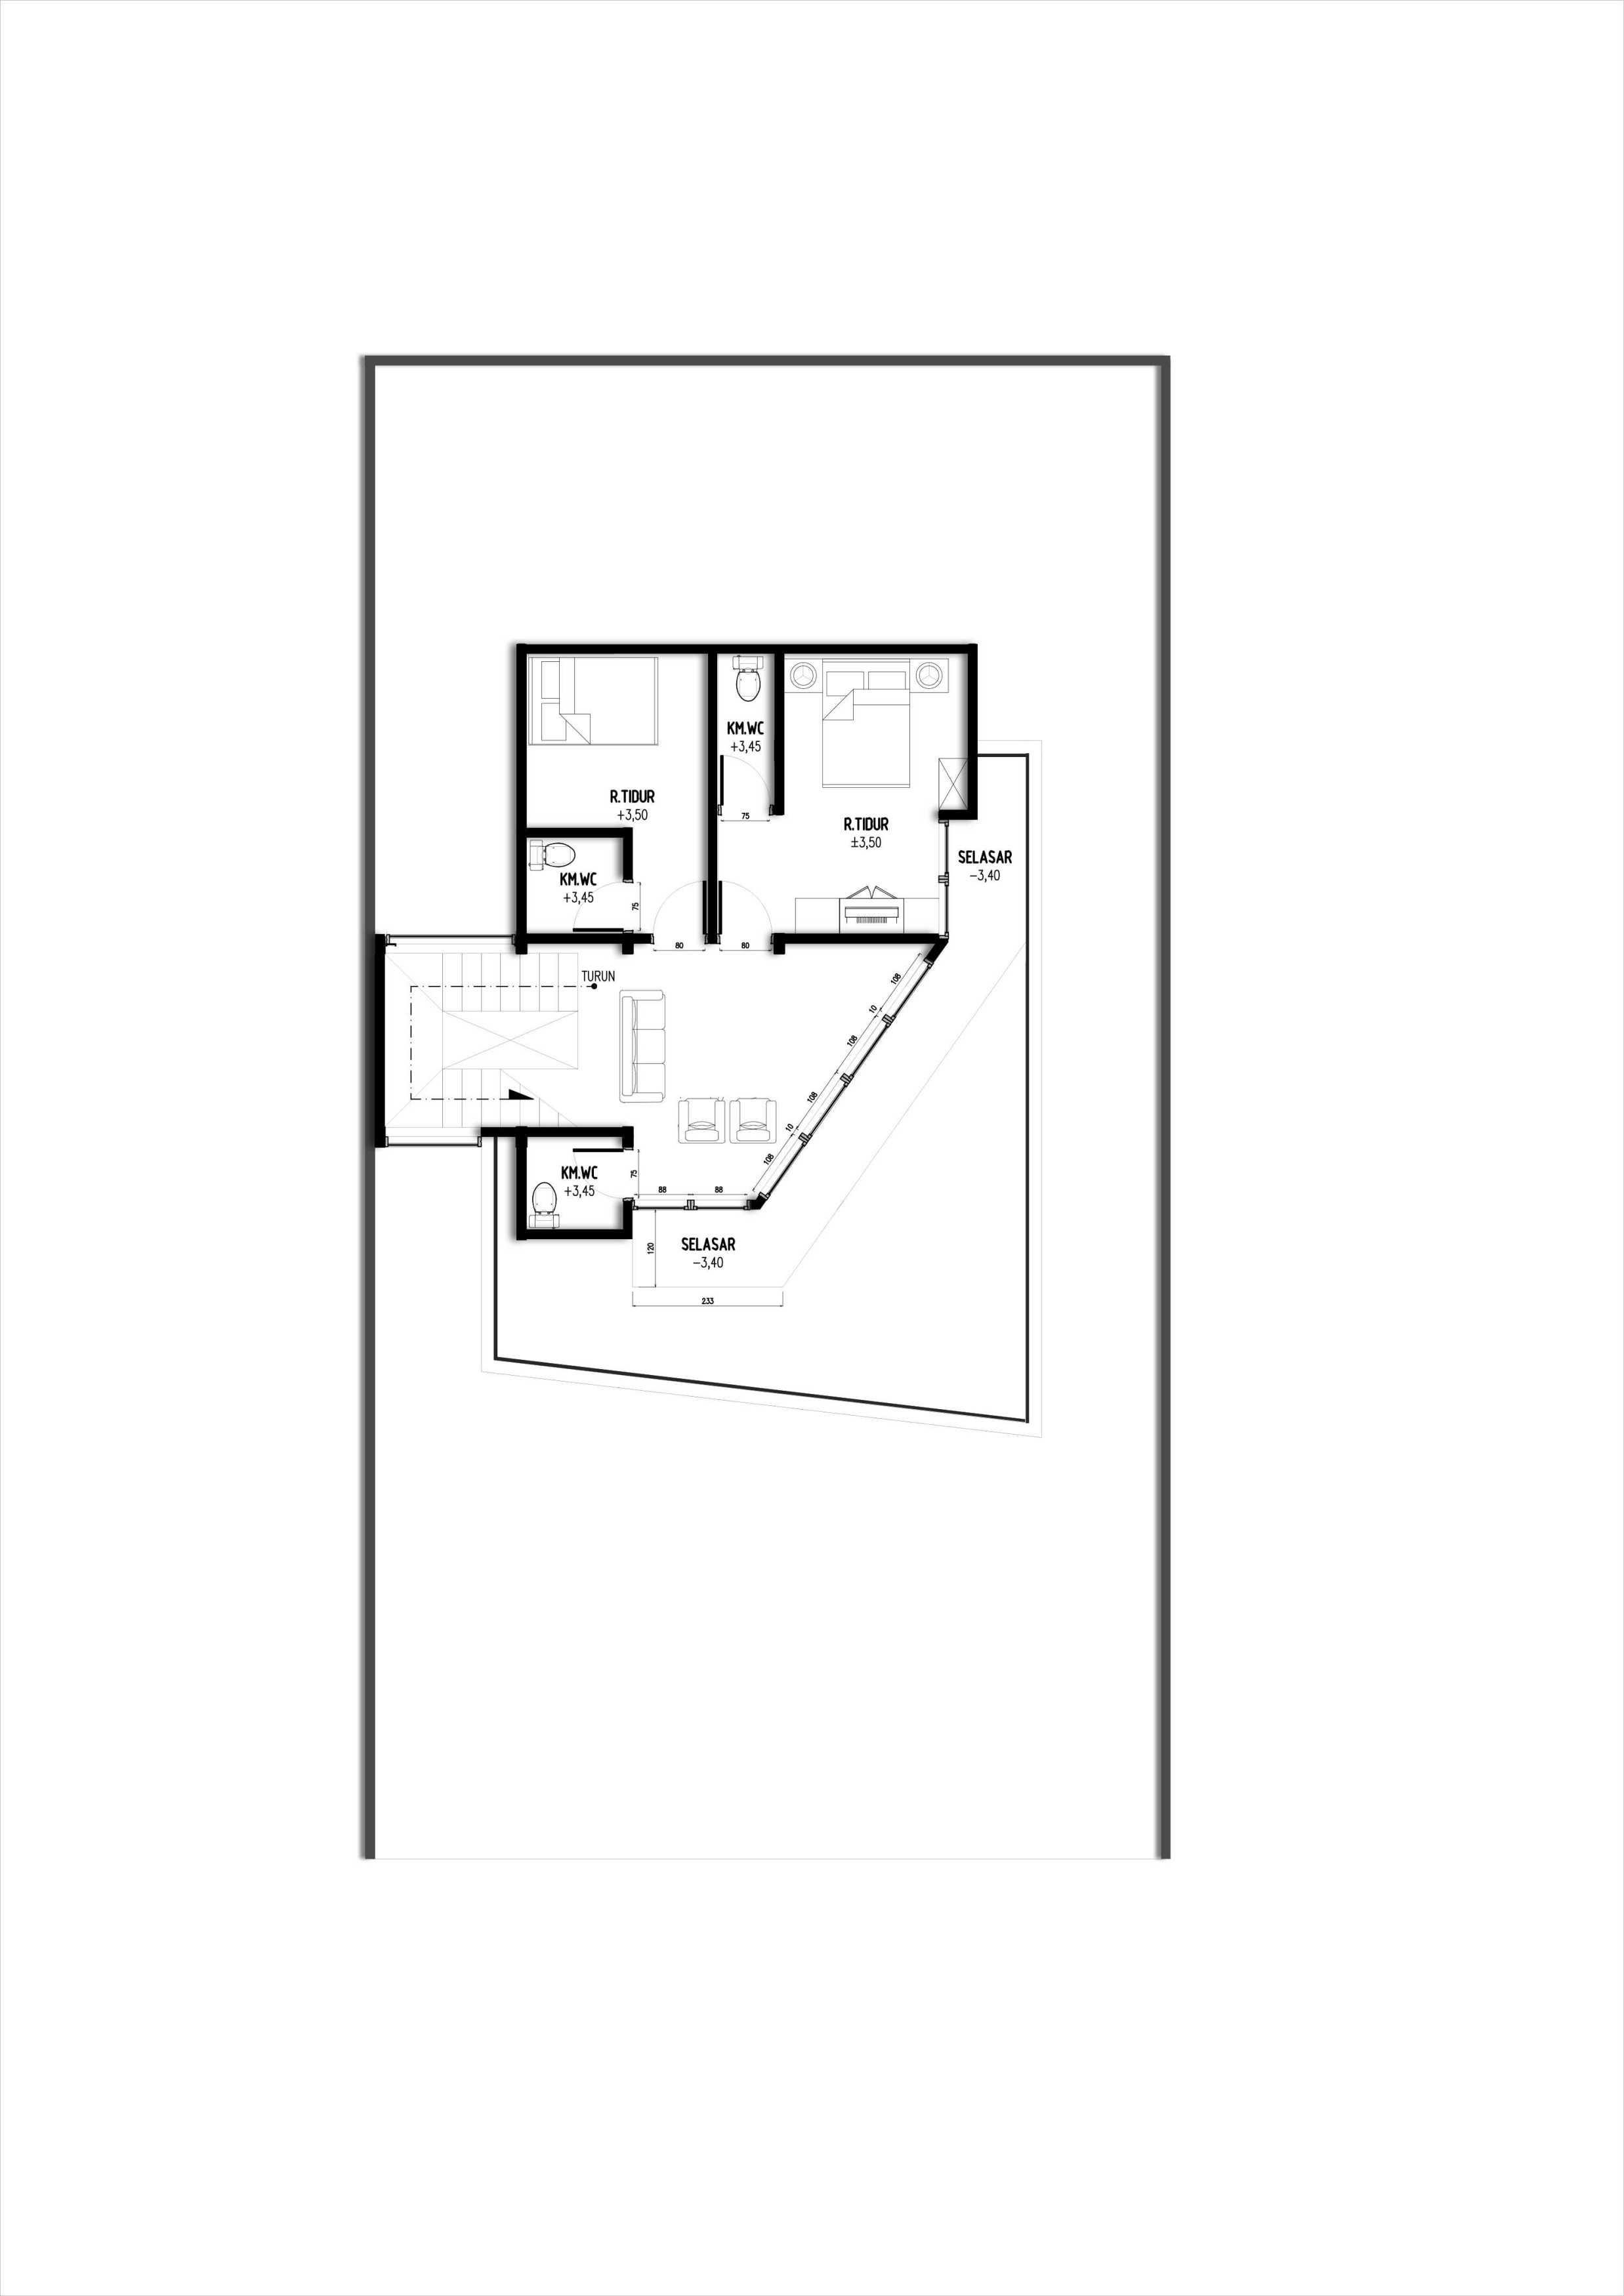 Gubah Ruang Sl House Bogor, Jawa Barat, Indonesia Bogor, Jawa Barat, Indonesia Floorplan Modern  51175